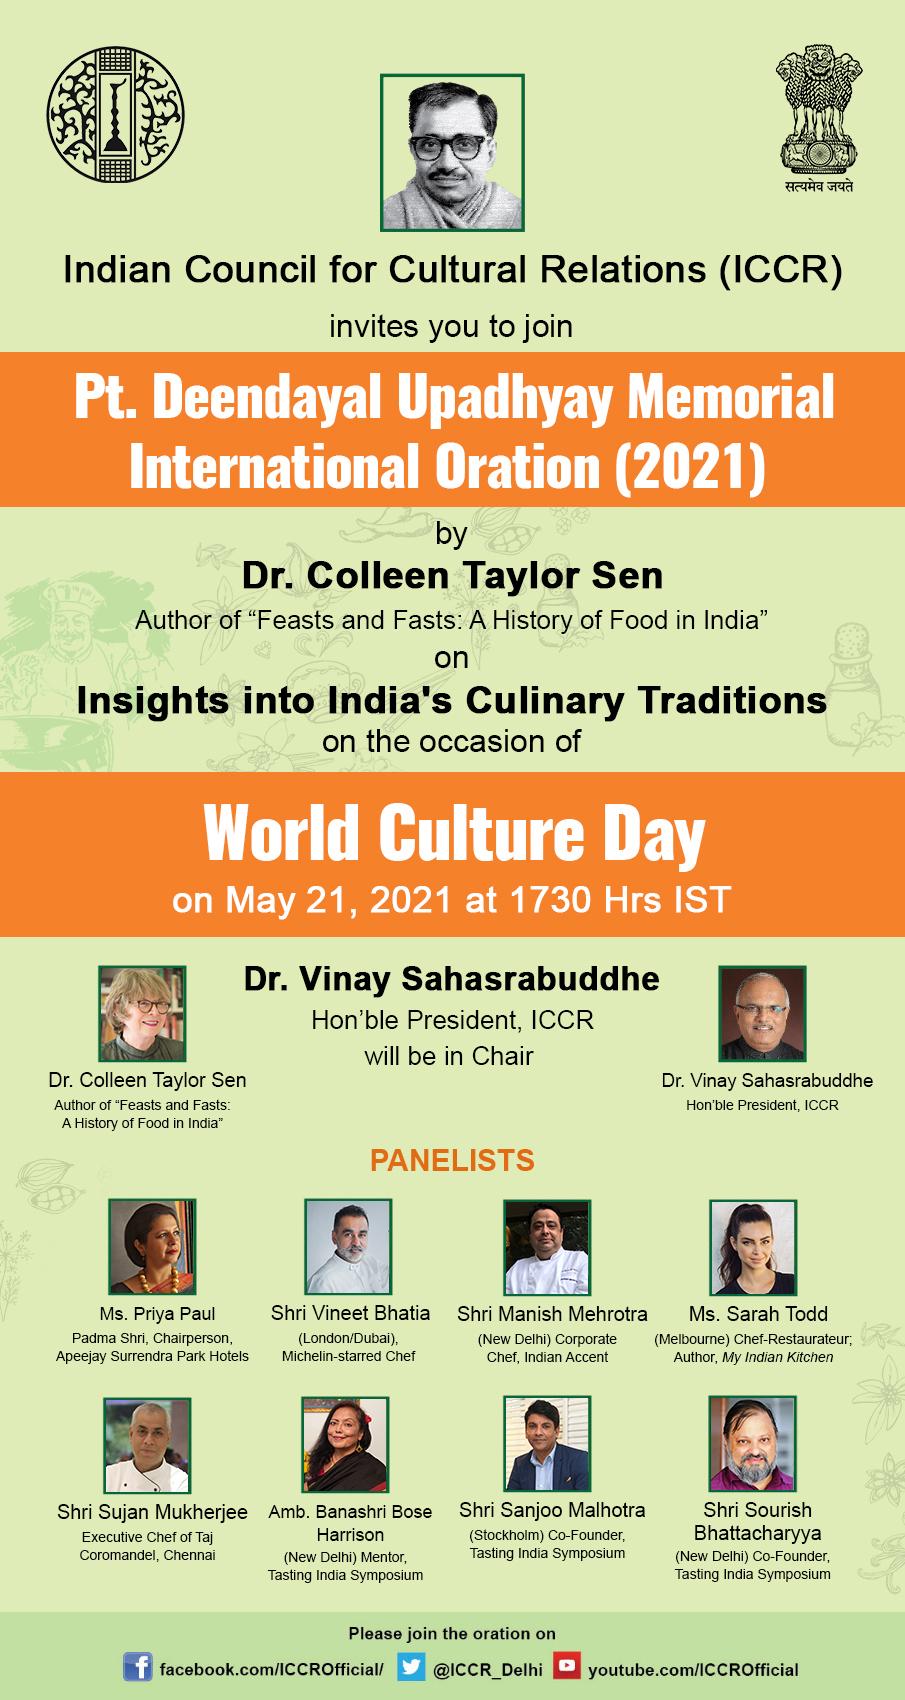 Photo source: https://iccr.gov.in/currentevent/4th-pandit-deendayal-upadhyay-memorial-international-oration-2021